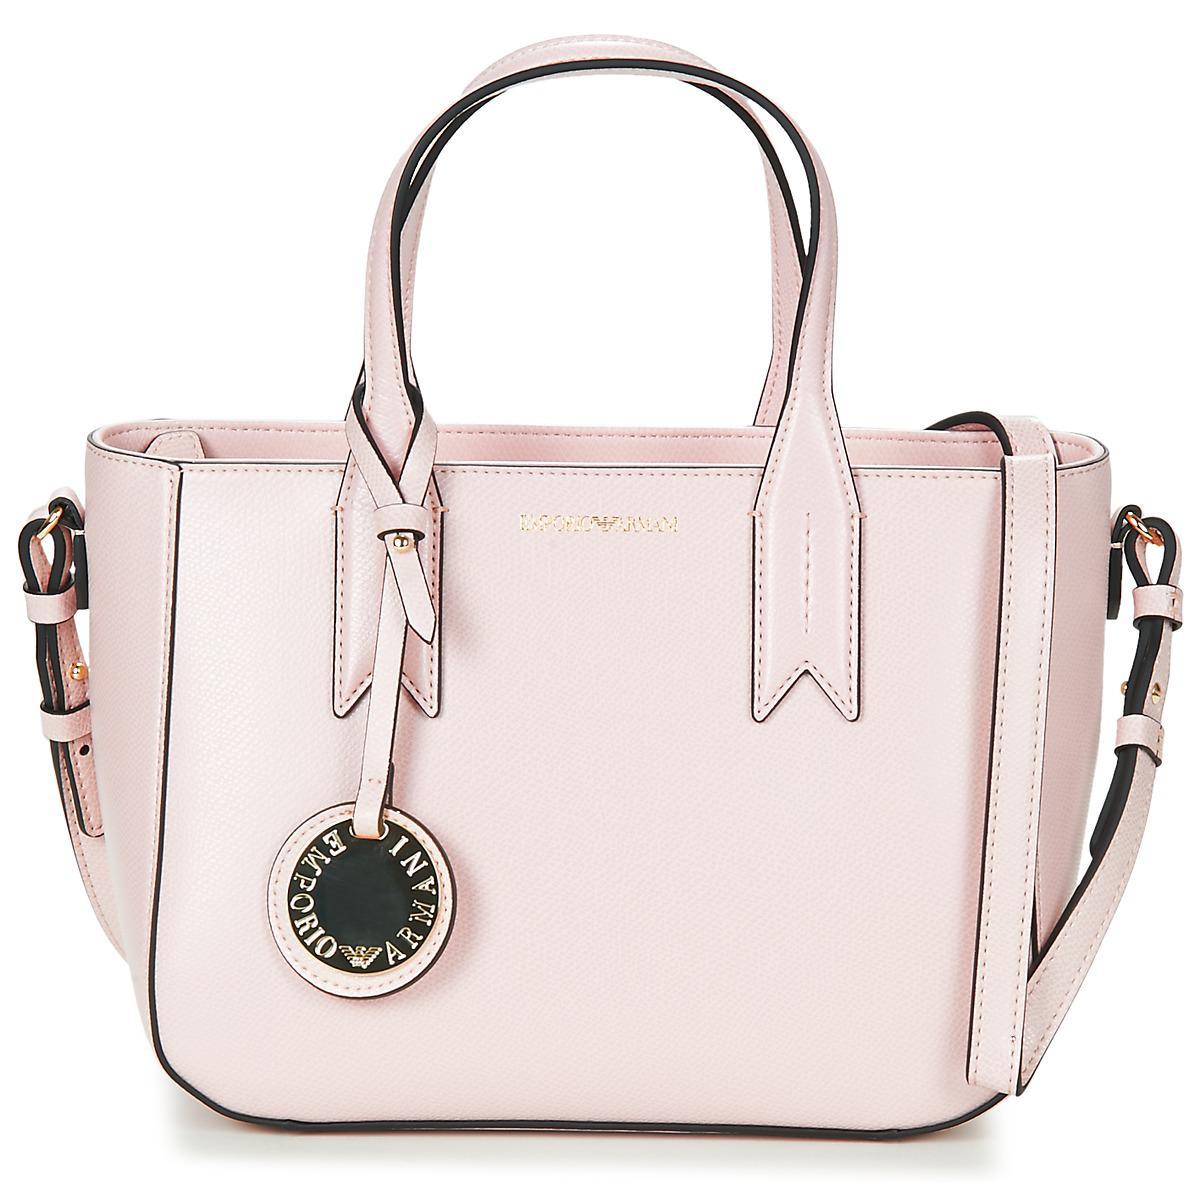 Emporio Armani Frida Tote Women S Handbags